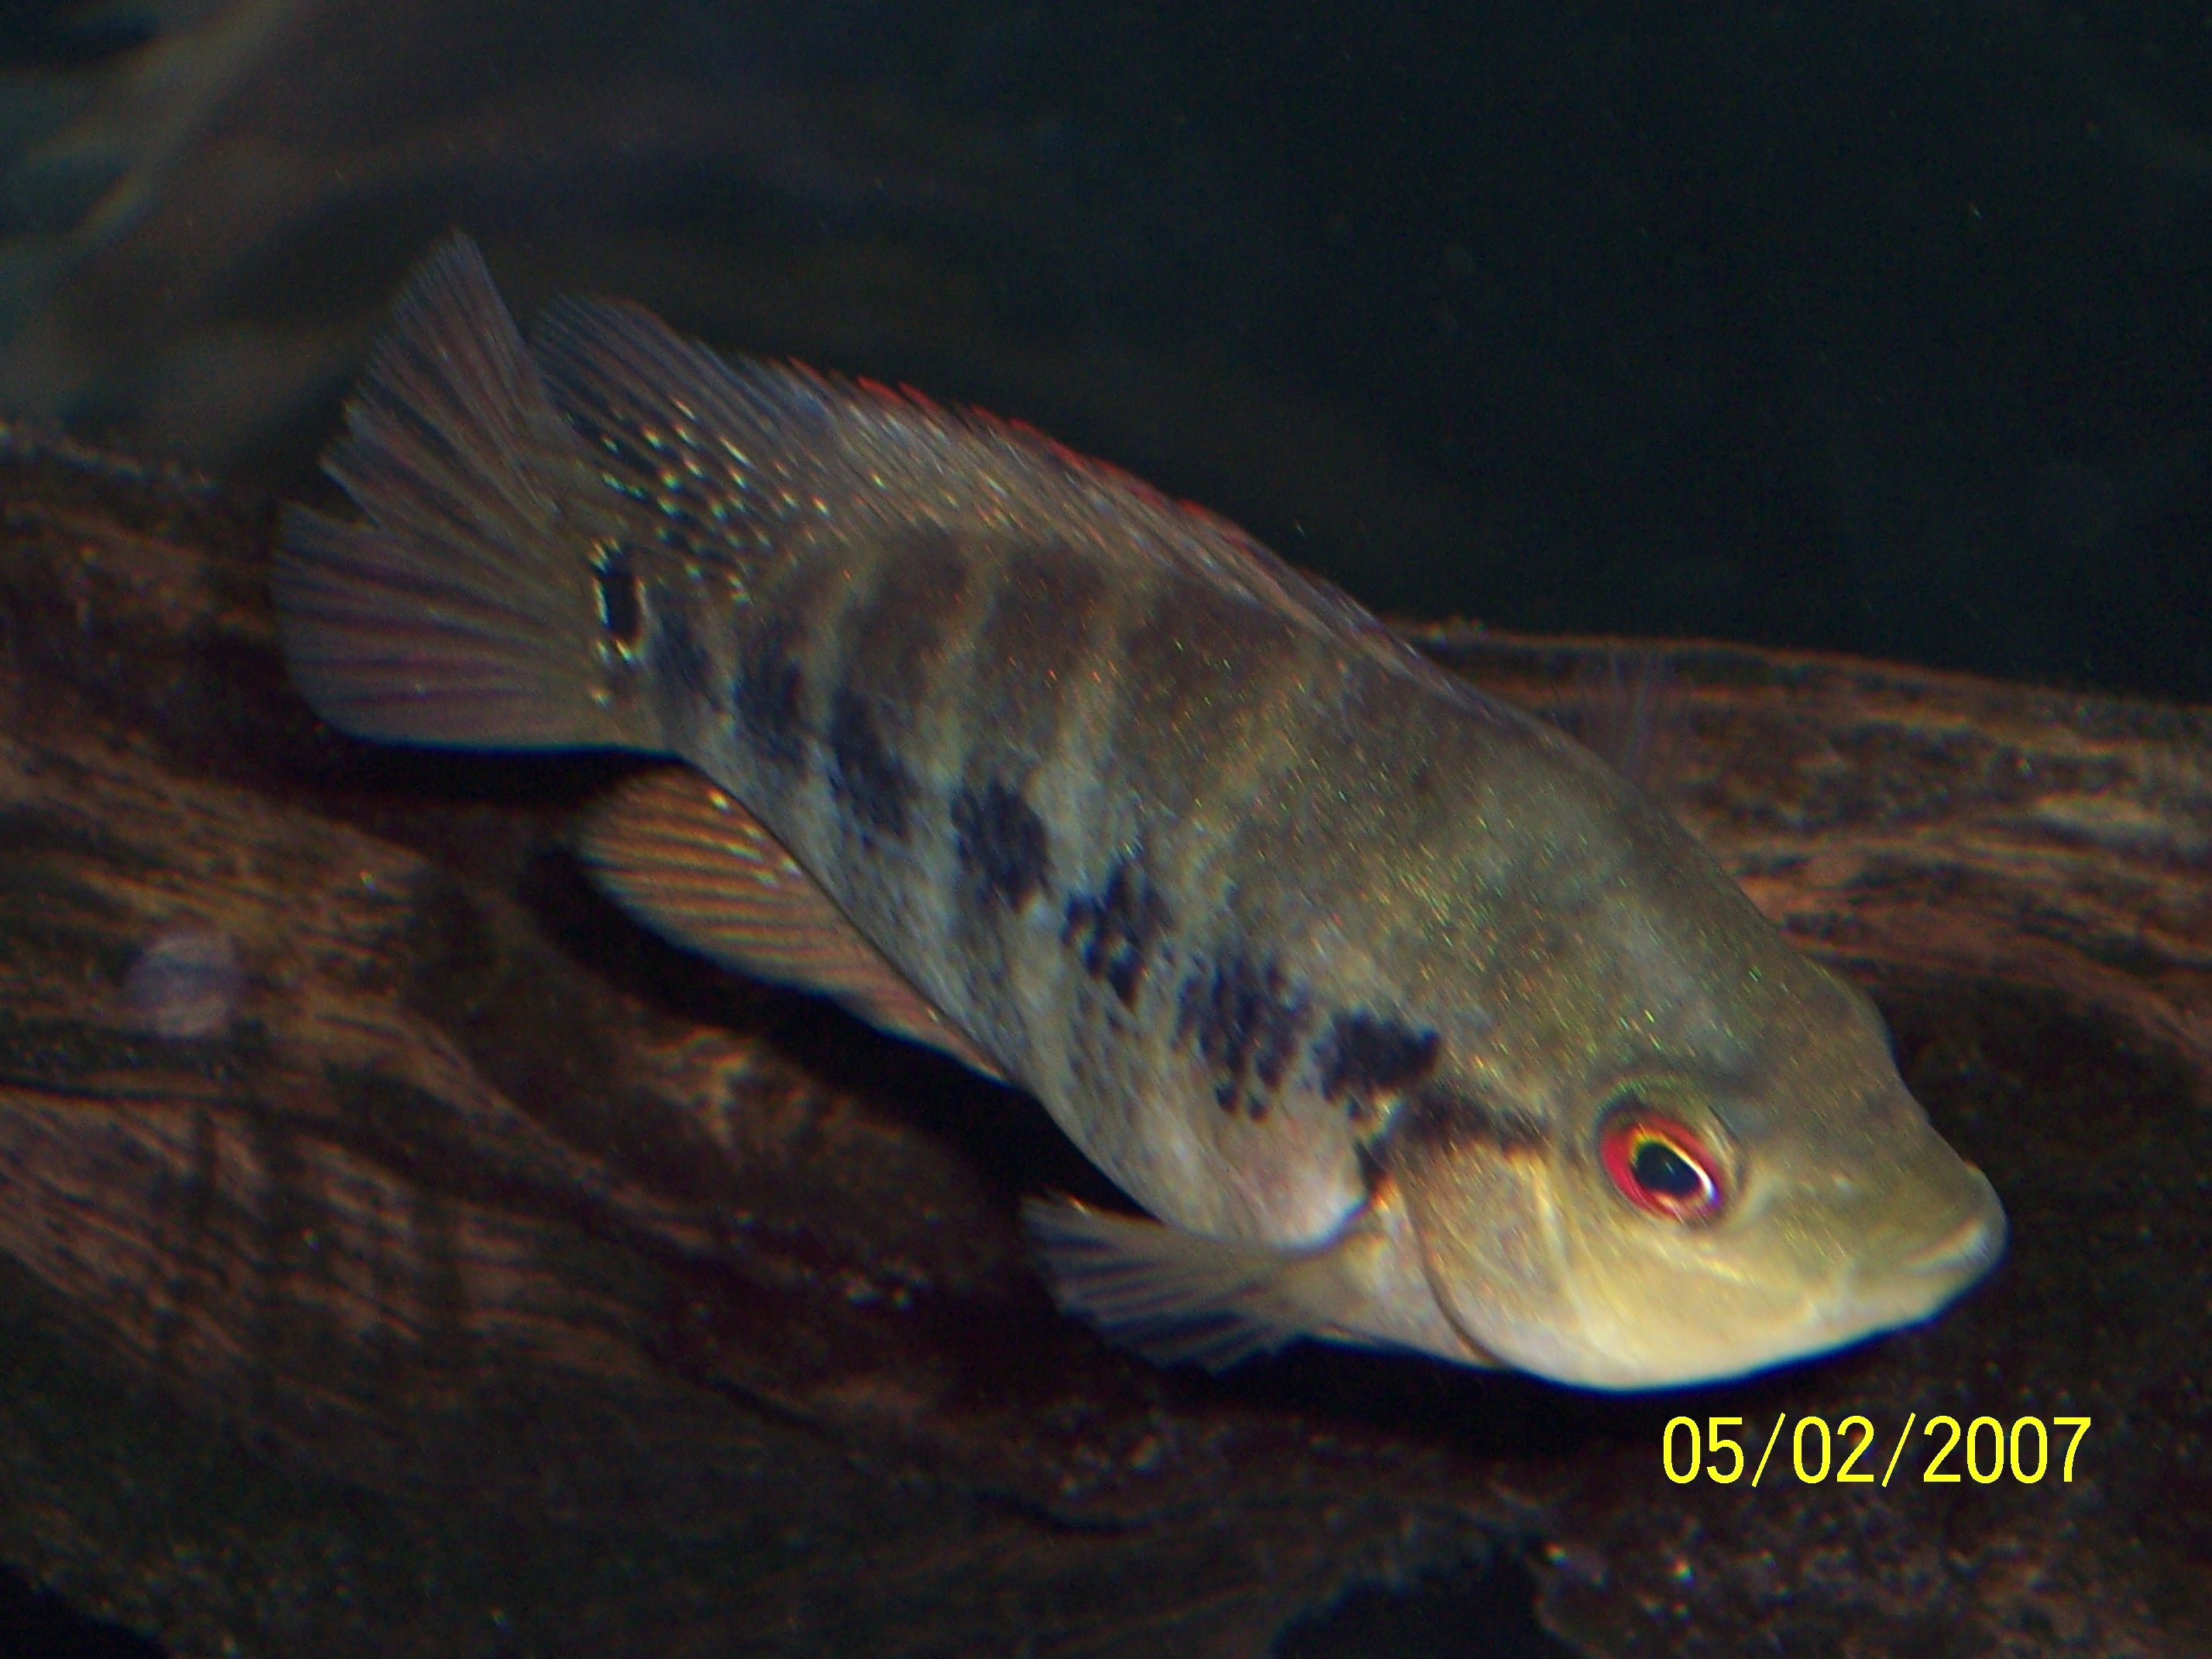 Amphilophus – Wikipedia